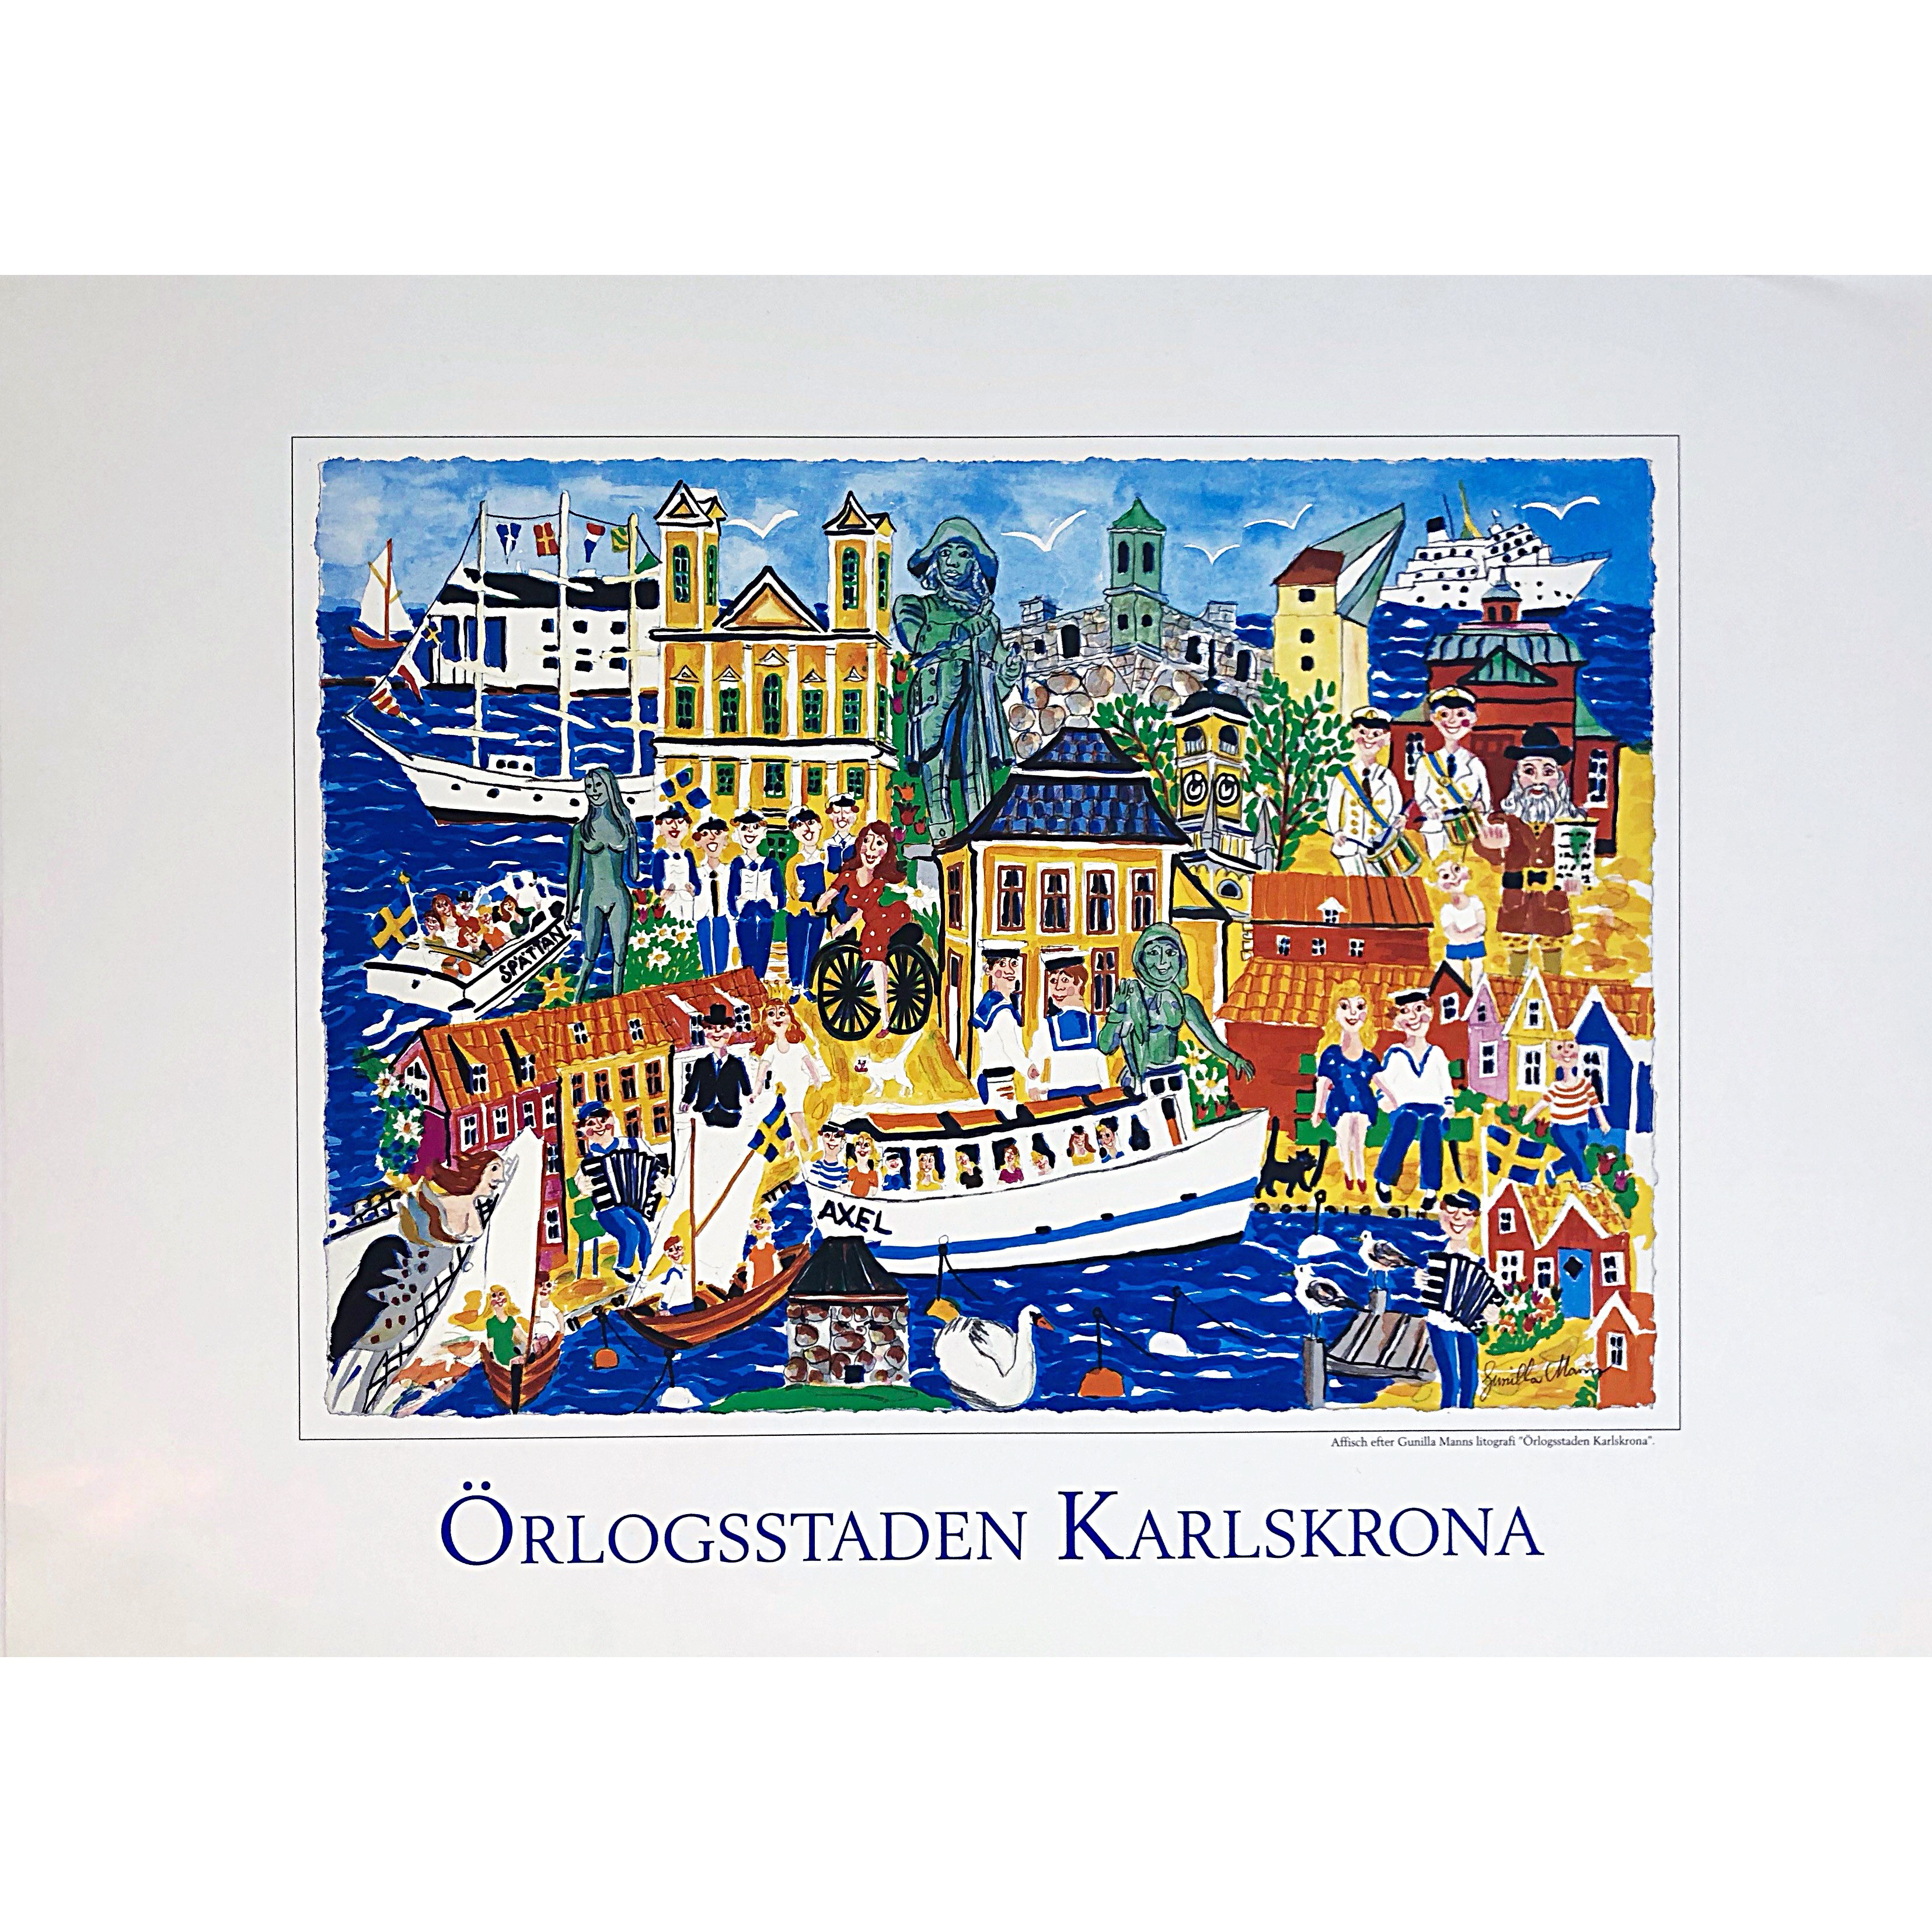 """Örlogsstaden Karlskrona"" Artposter by Gunilla Mann. 70 x 50 cm"